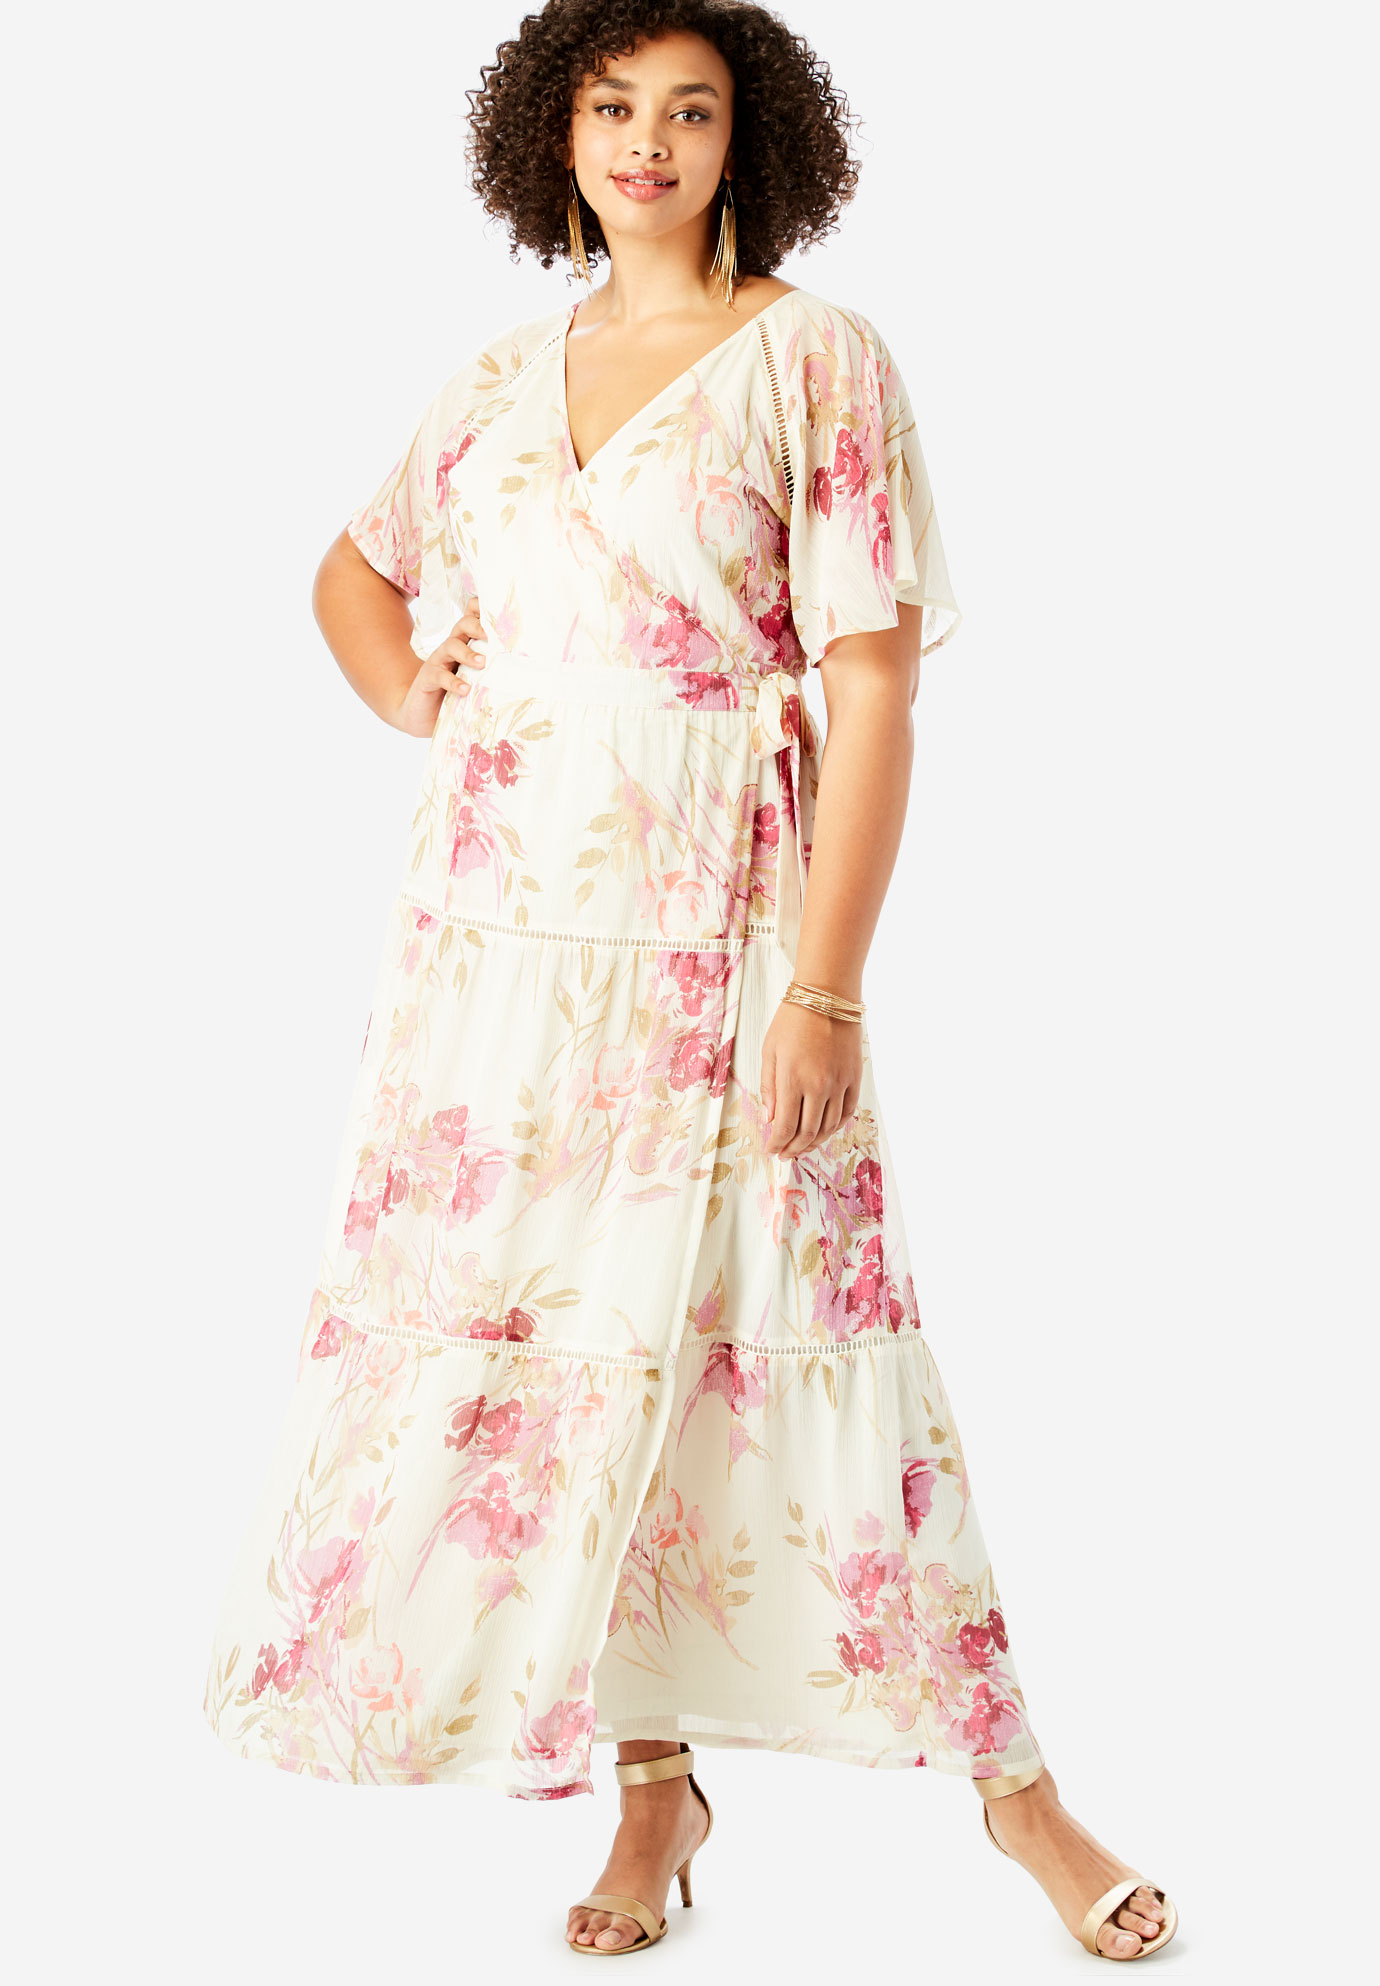 77d01799acb Surplice Maxi Dress in Crinkle